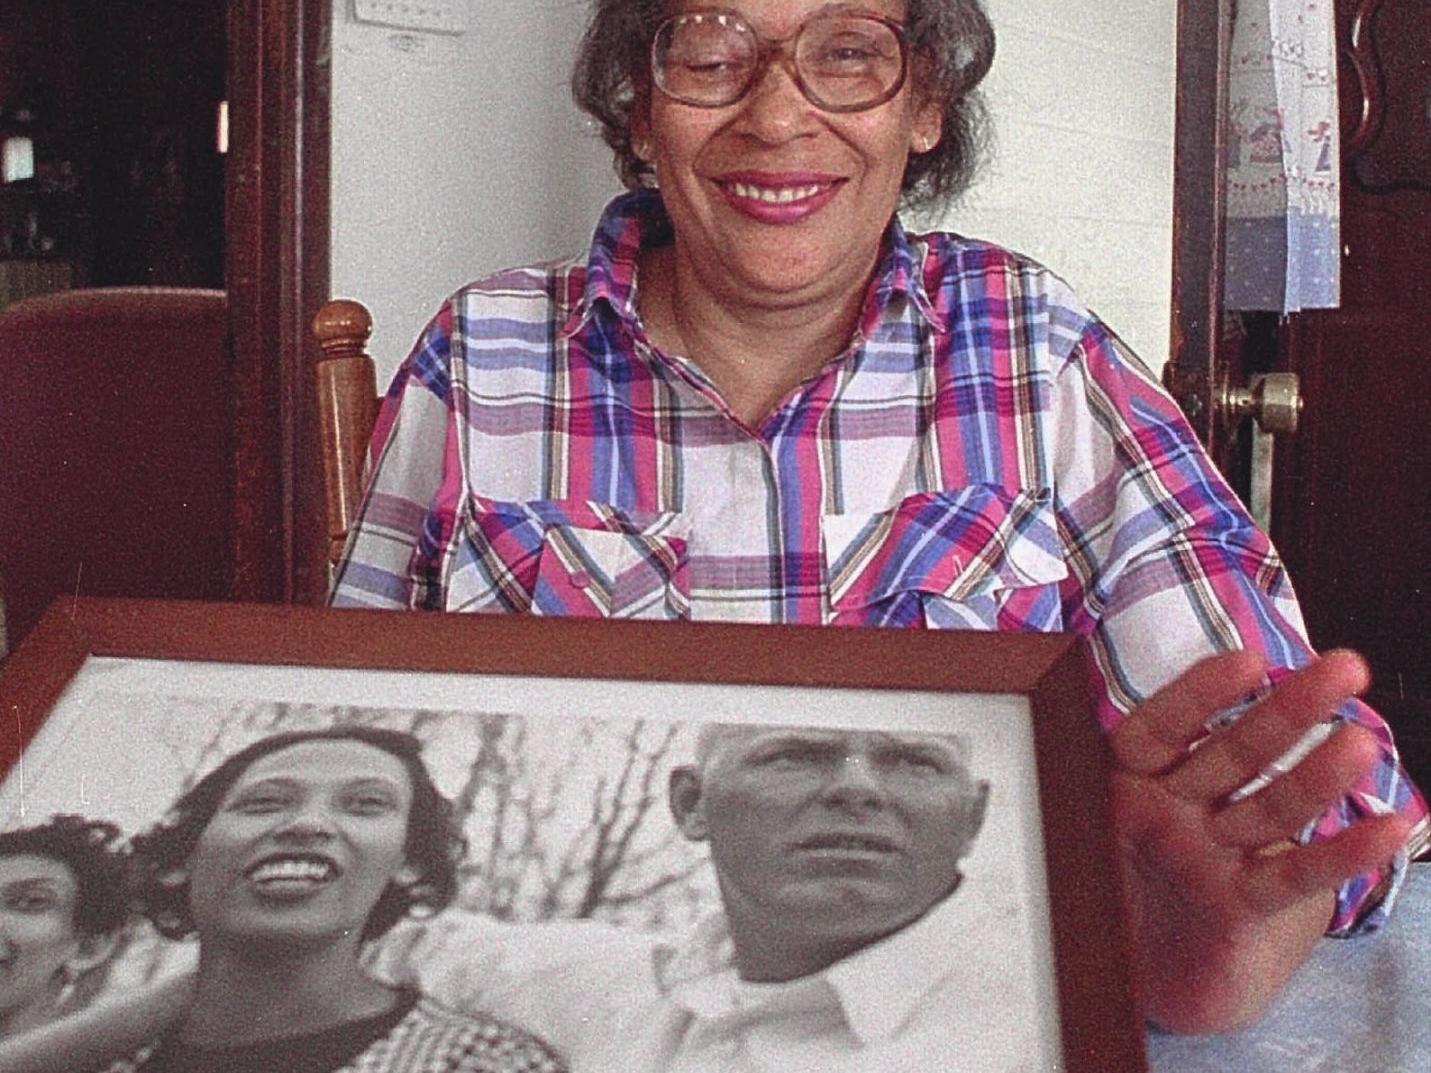 Historic Marker On Loving Case To Be Dedicated Monday Local News Fredericksburg Com